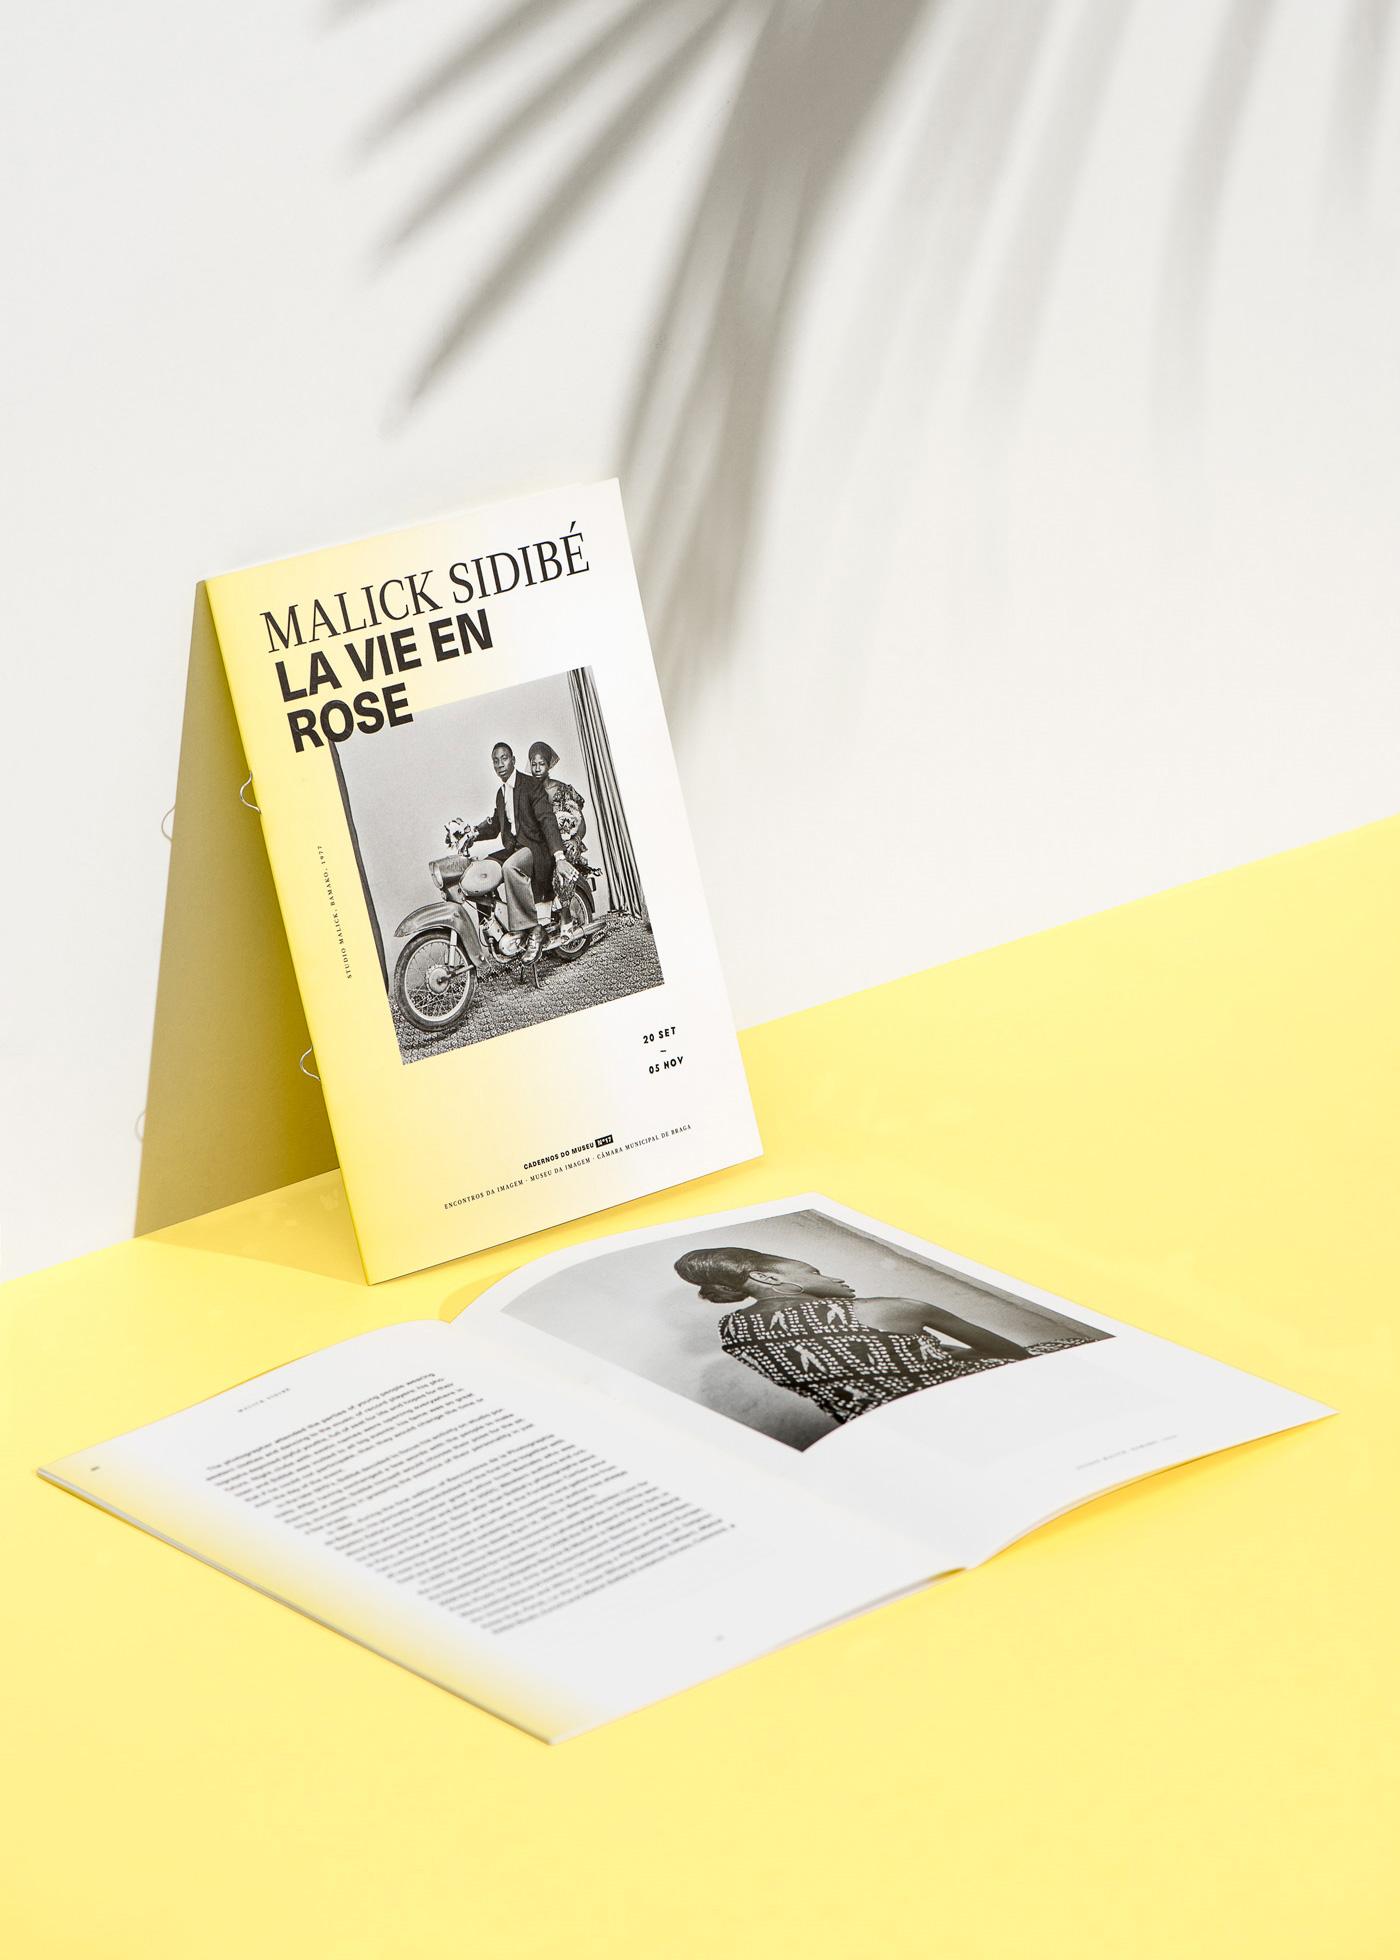 Encontros da Imagem 2016 Malick Sidibé exhibition booklet by Gen Design Studio